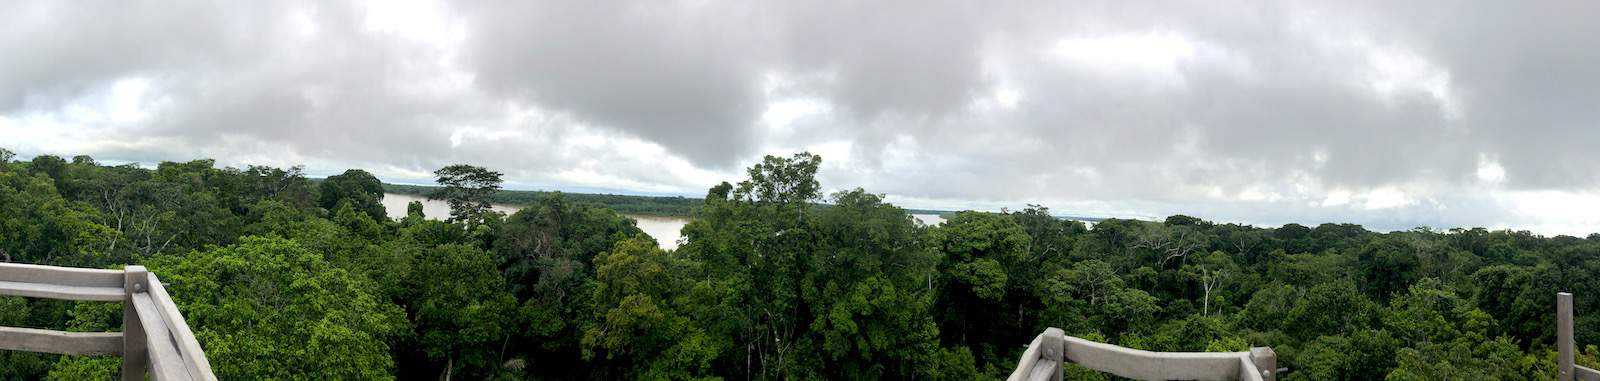 Tree top view of Peru Jungle